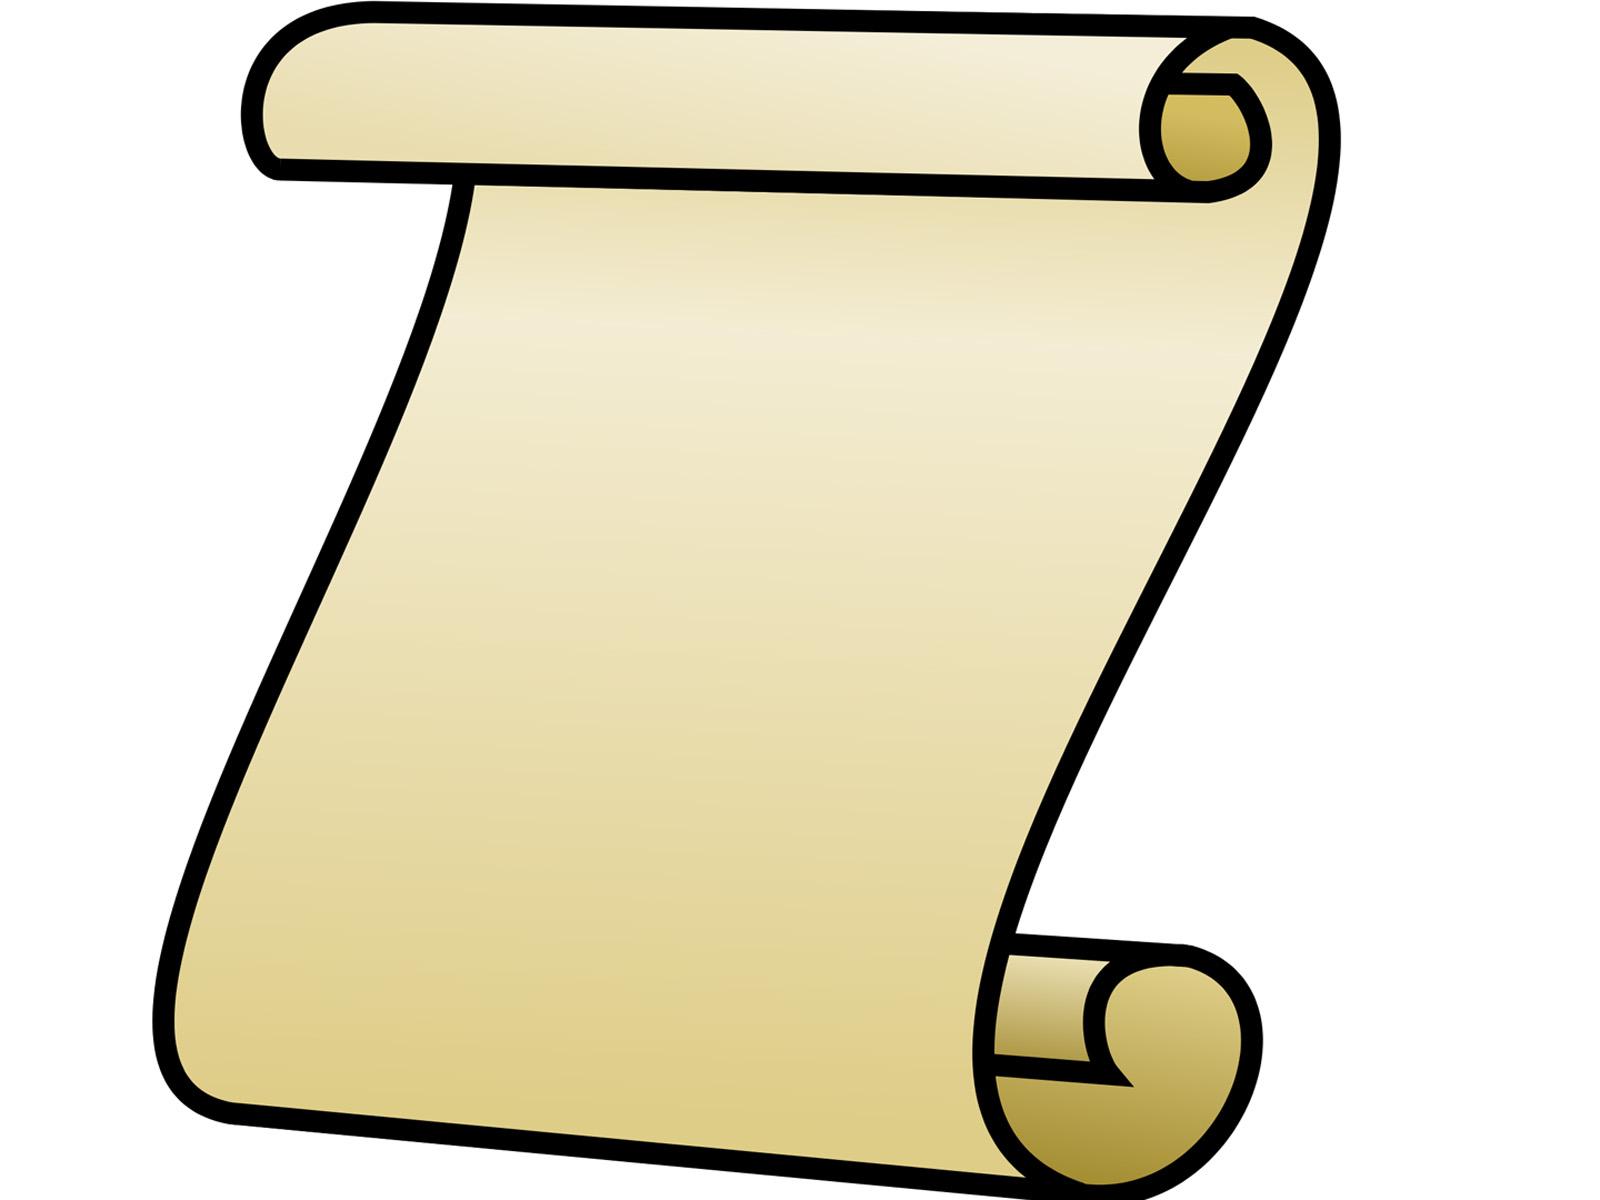 Announcement scroll clipart jpg download Announcement clipart tiny 3 - ClipartAndScrap jpg download